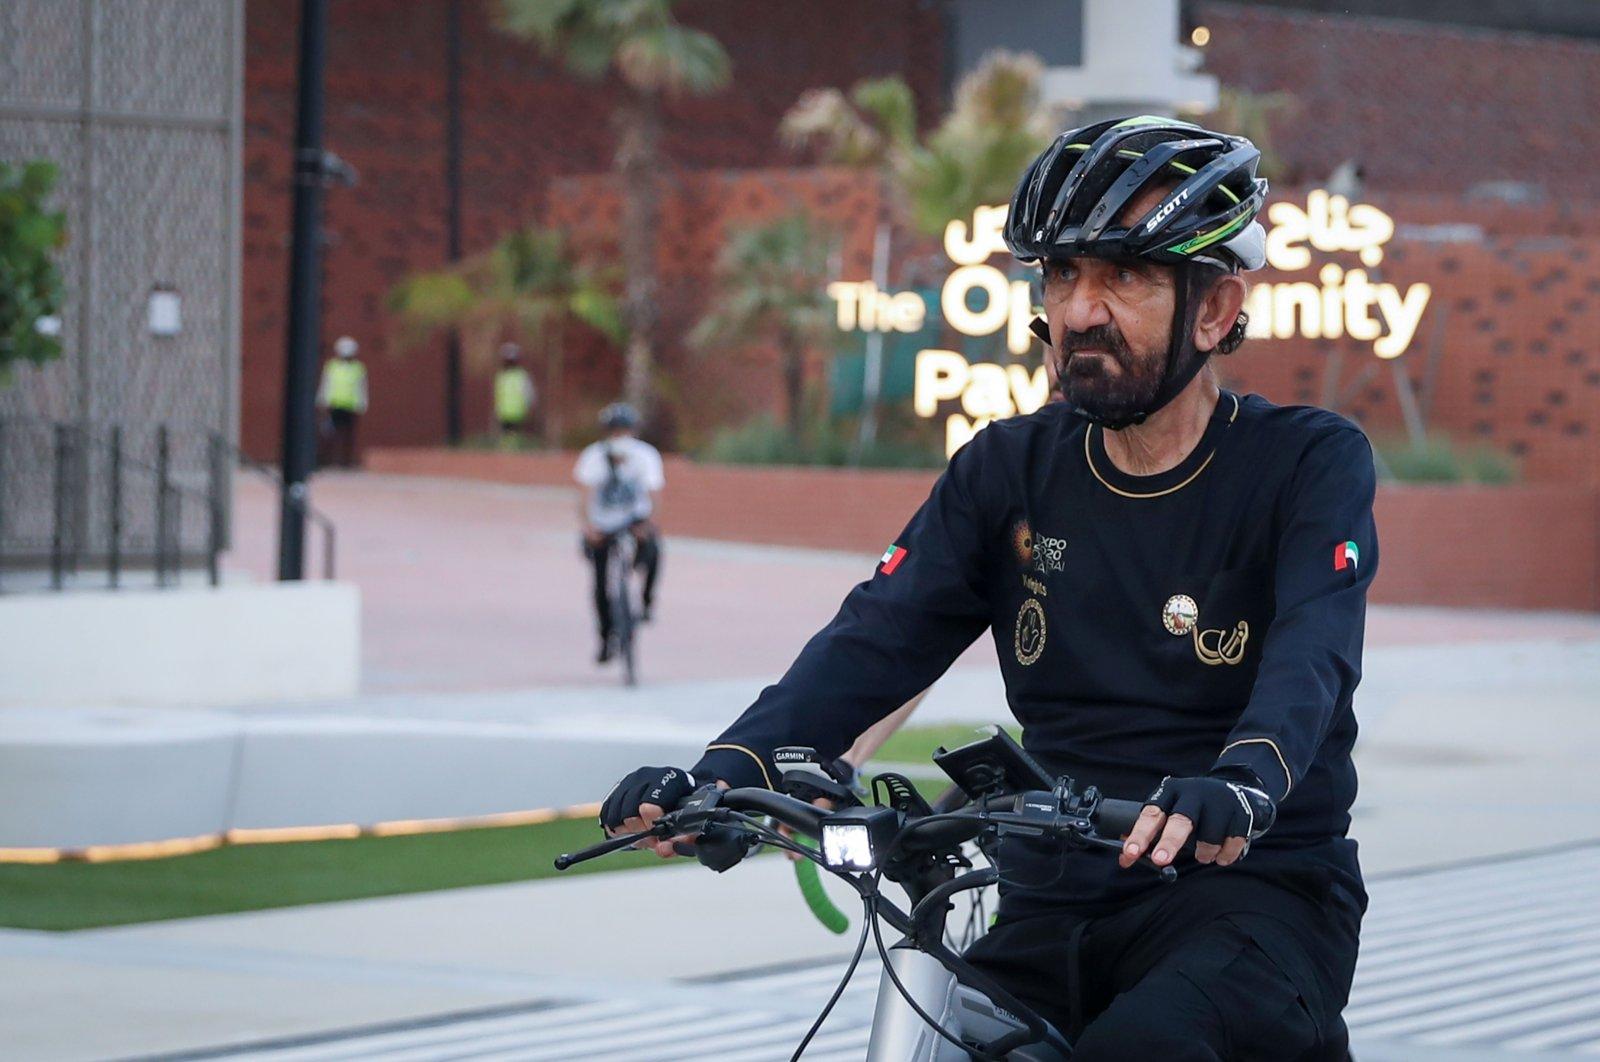 Prime Minister of the United Arab Emirates and ruler of Dubai, Sheikh Mohammed bin Rashid al-Maktoum cycles through the Dubai Expo 2020 site in Dubai, United Arab Emirates, Sept. 11, 2021. (Reuters Photo)